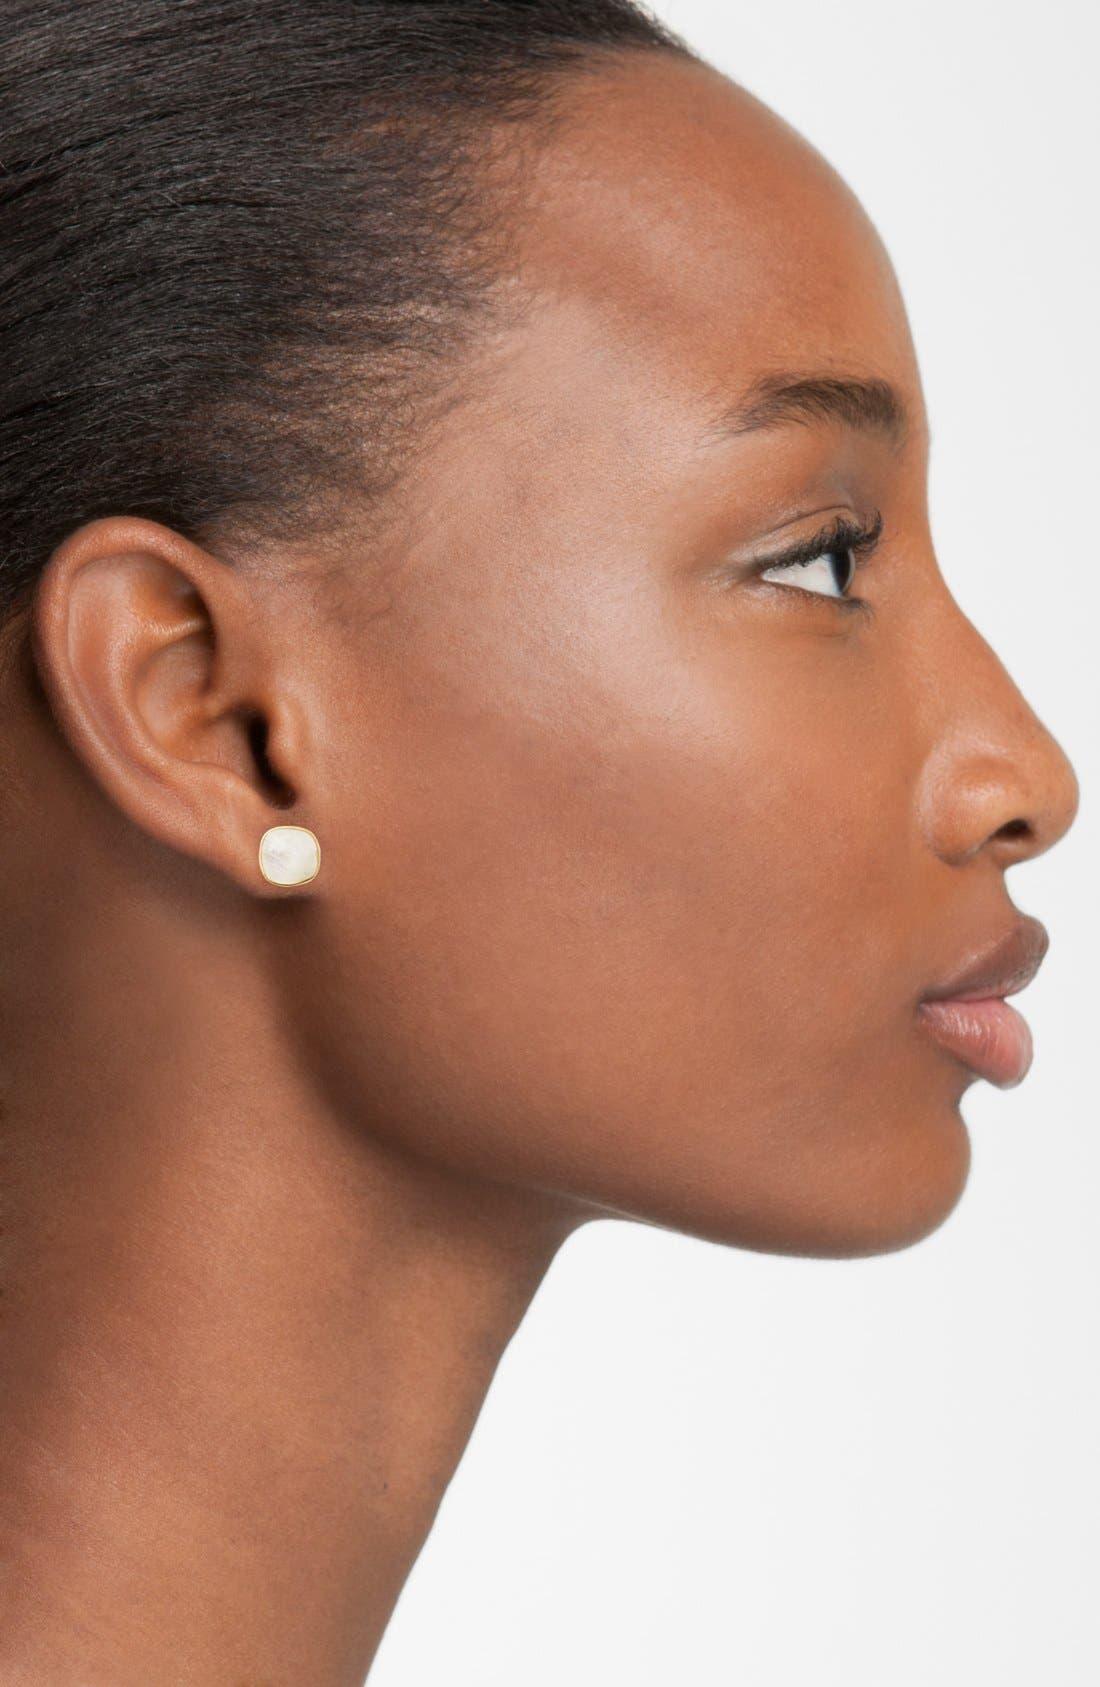 Semiprecious Stone Stud Earrings,                             Alternate thumbnail 2, color,                             Gold/ Moonstone